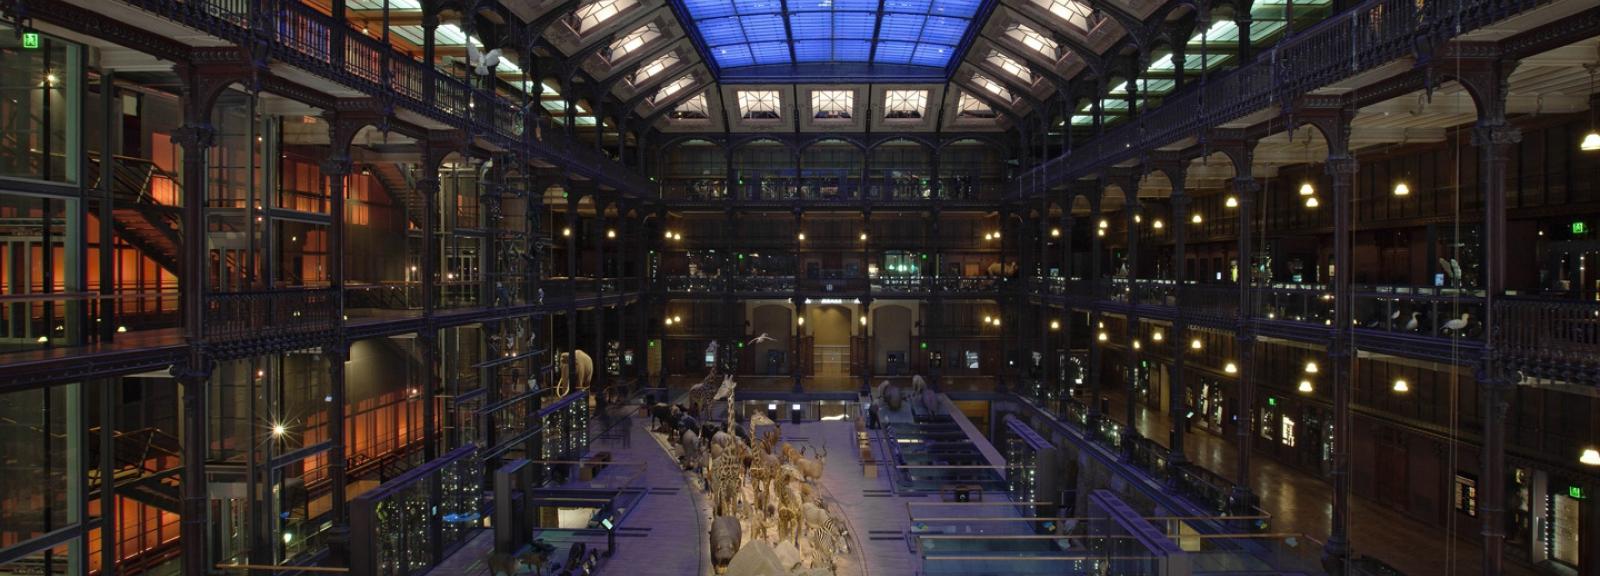 Savane africaine - Grande Galerie de l'Évolution © MNHN - Bernard Faye